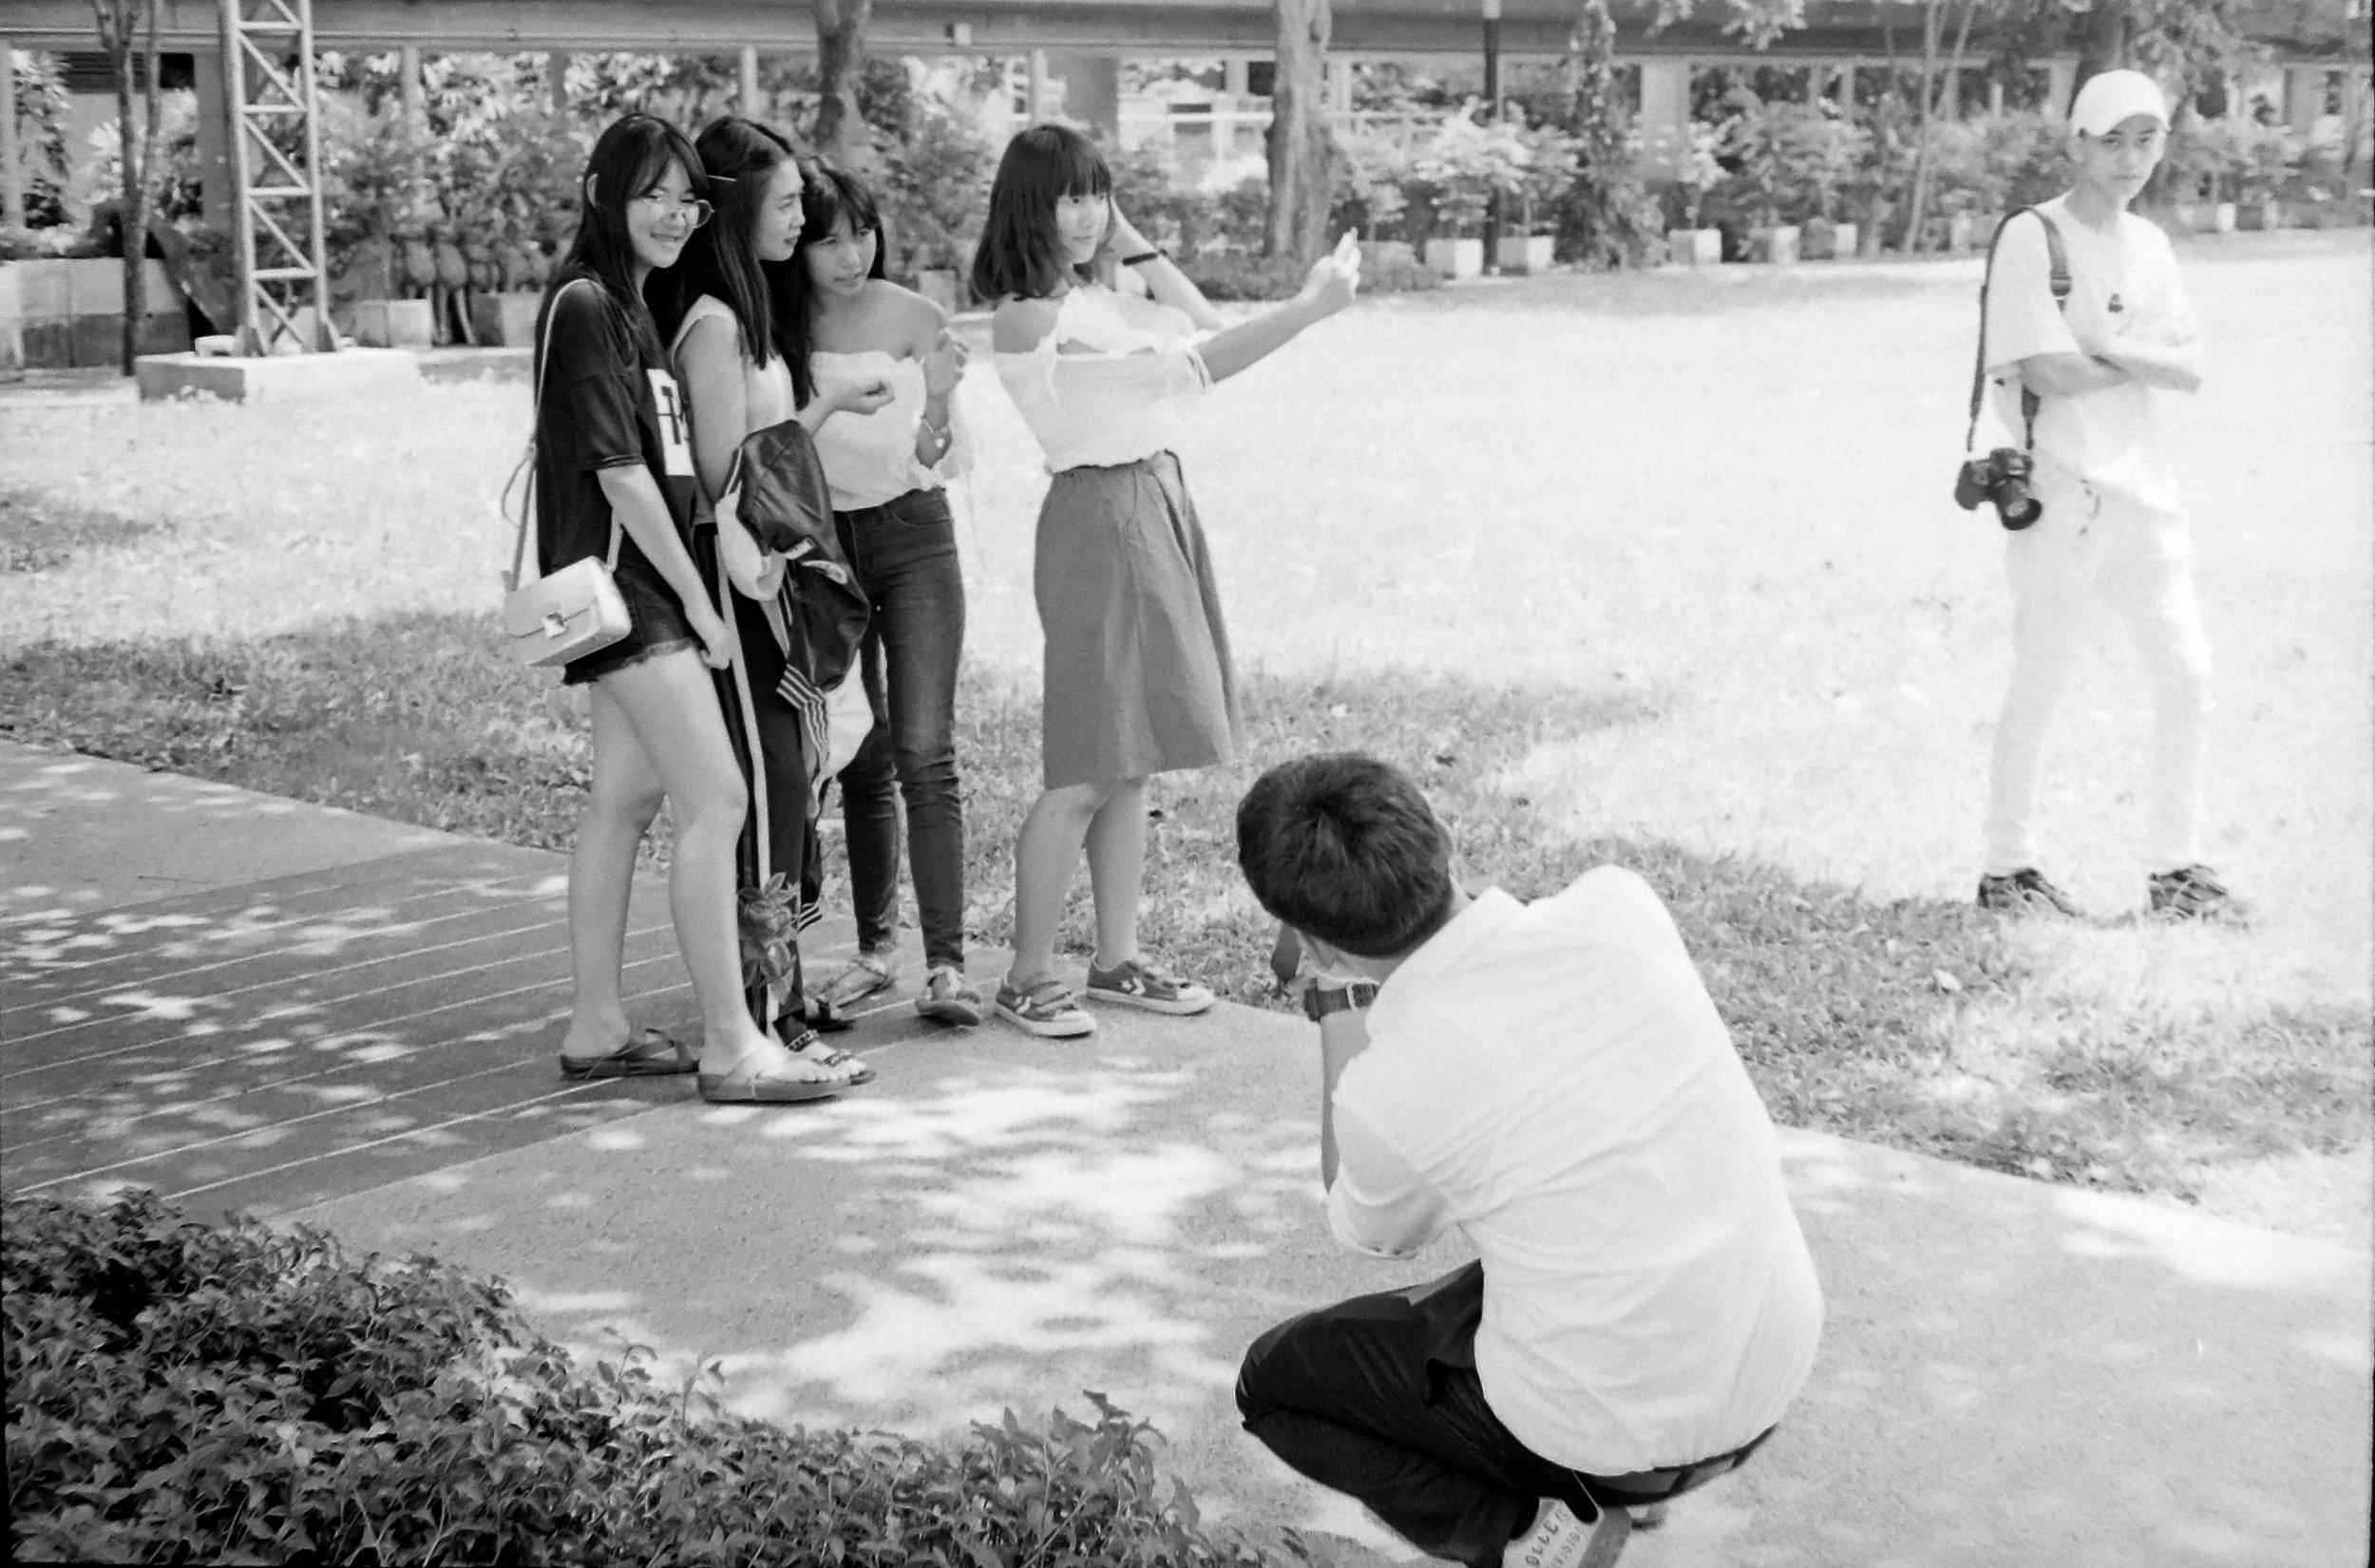 chromacomaphoto street photography bangkok thailand film tri x summicron rigid 50 leica m4 black and white (17).JPG